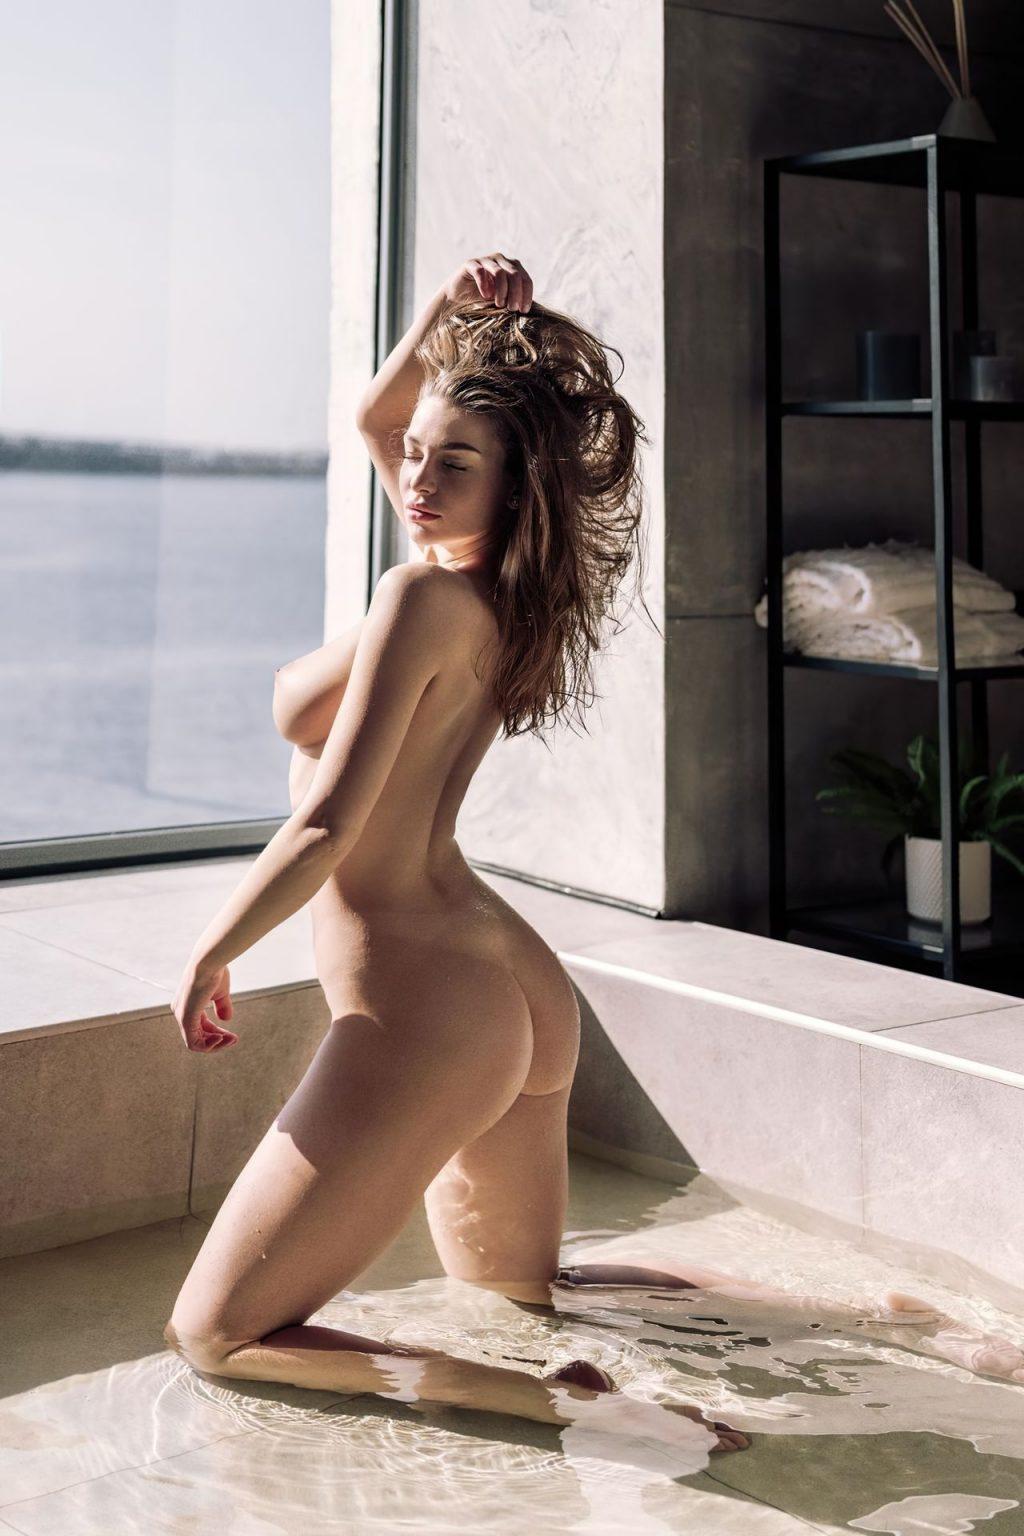 Yana Palchevskaya Nude (10 Photos)